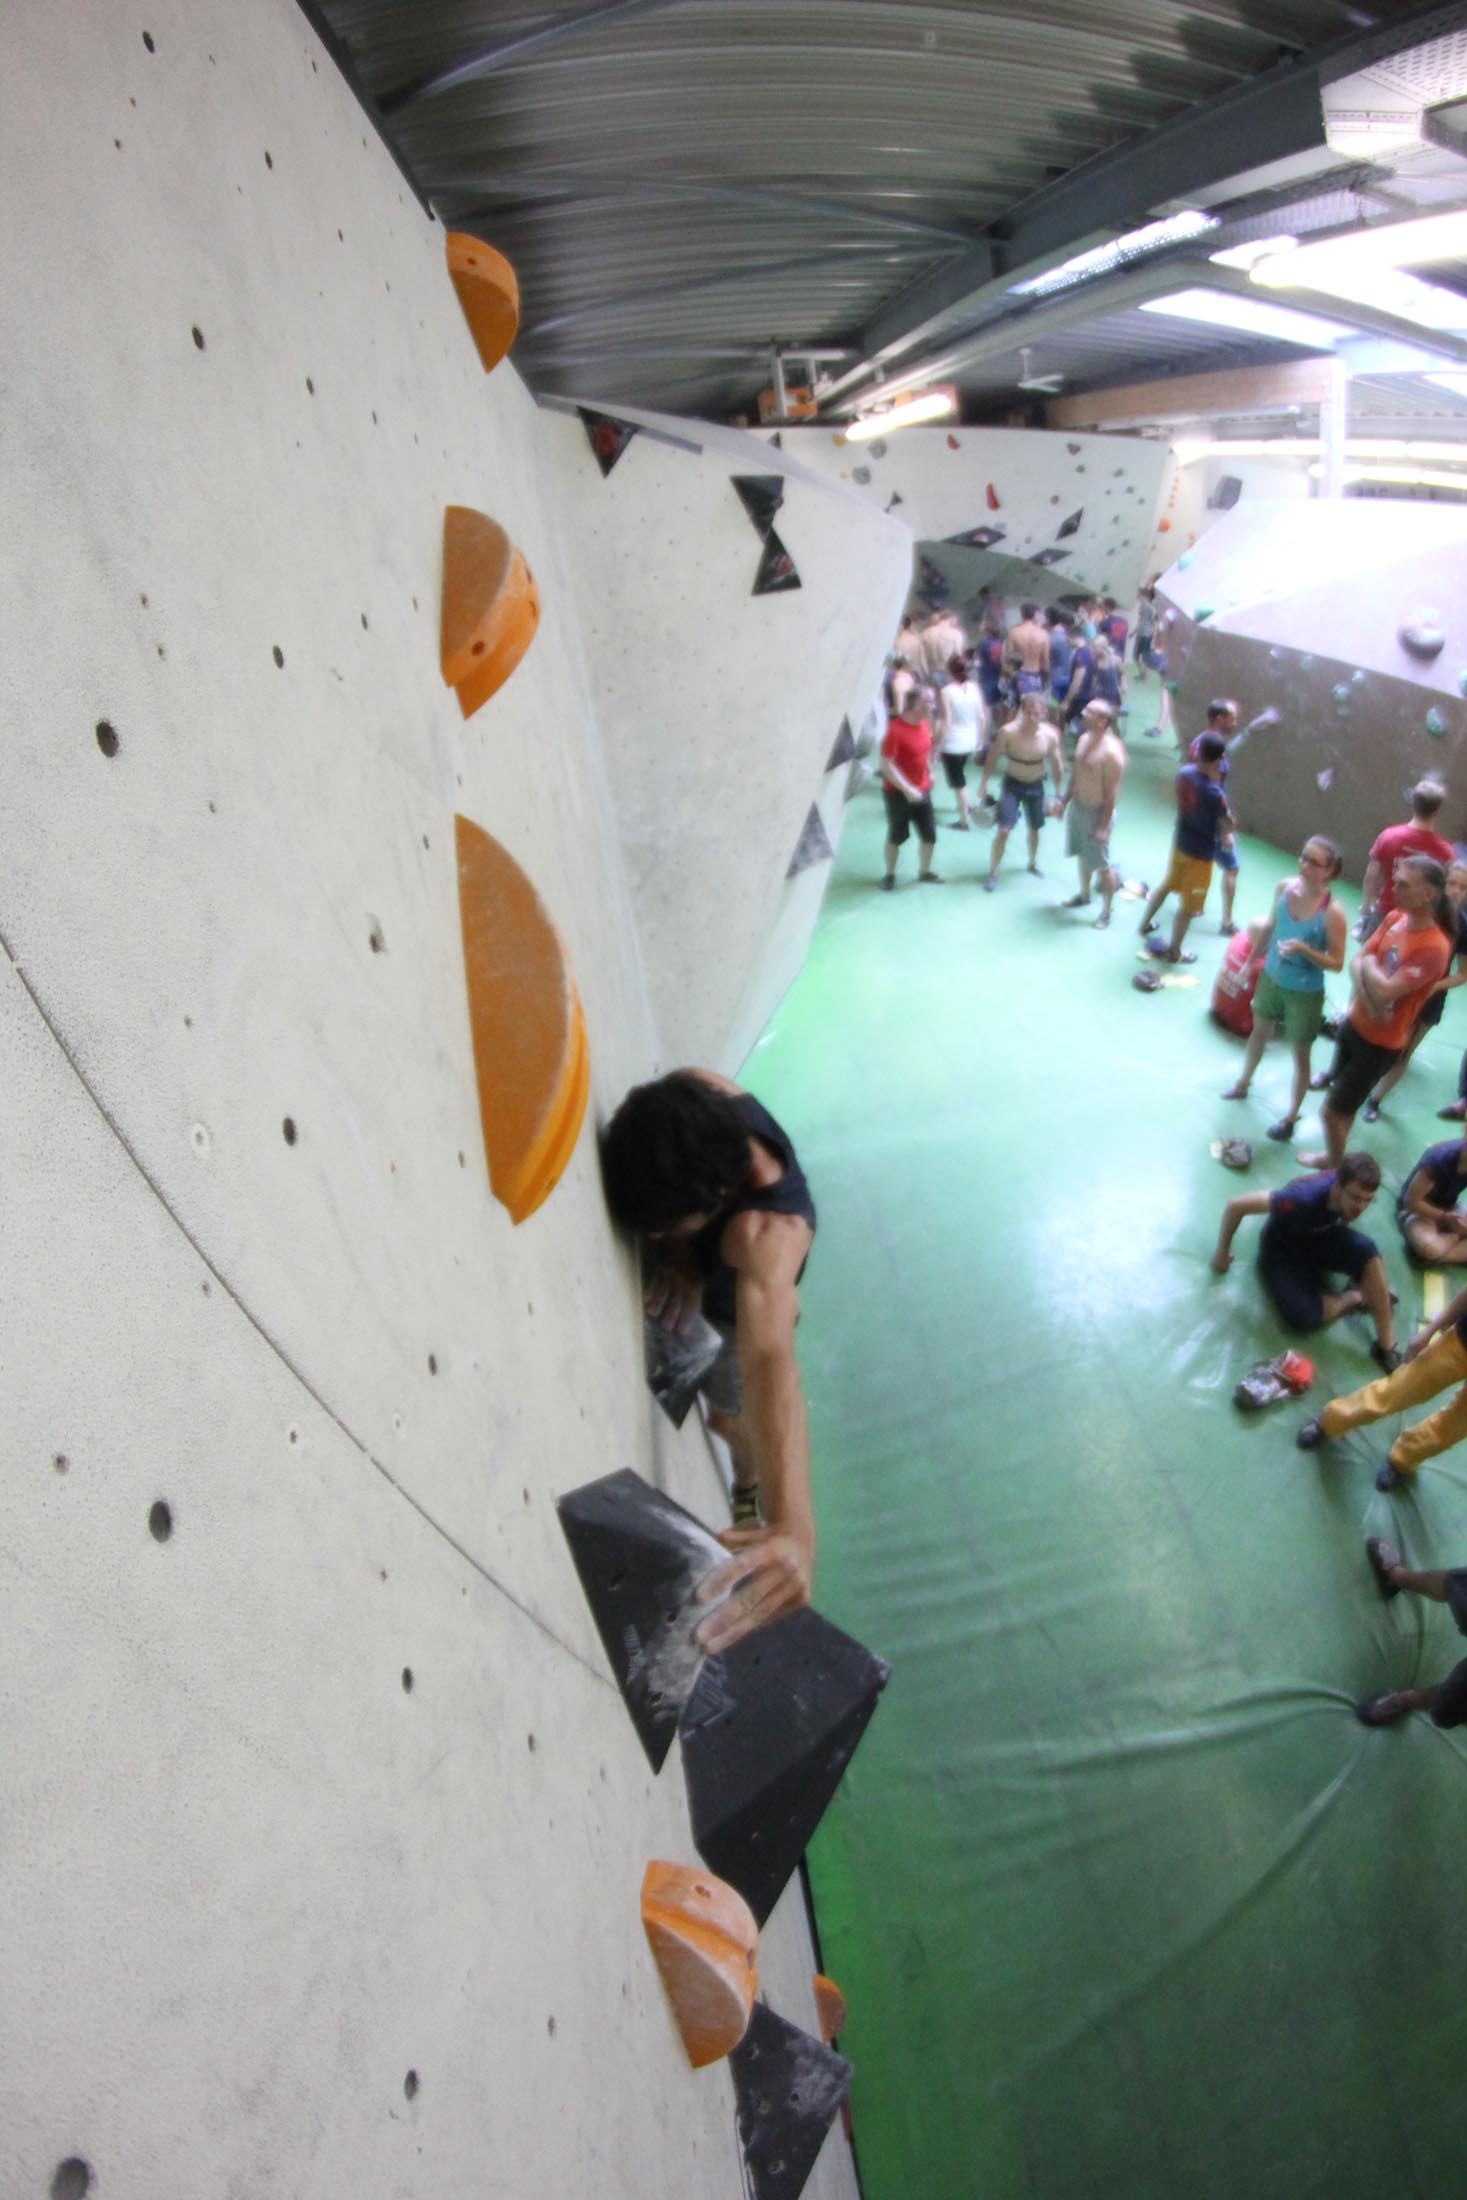 Quali, internationaler bouldercup Frankenjura 2016, BLOCKHELDEN Erlangen, Mammut, Bergfreunde.de, Boulderwettkampf07092016165